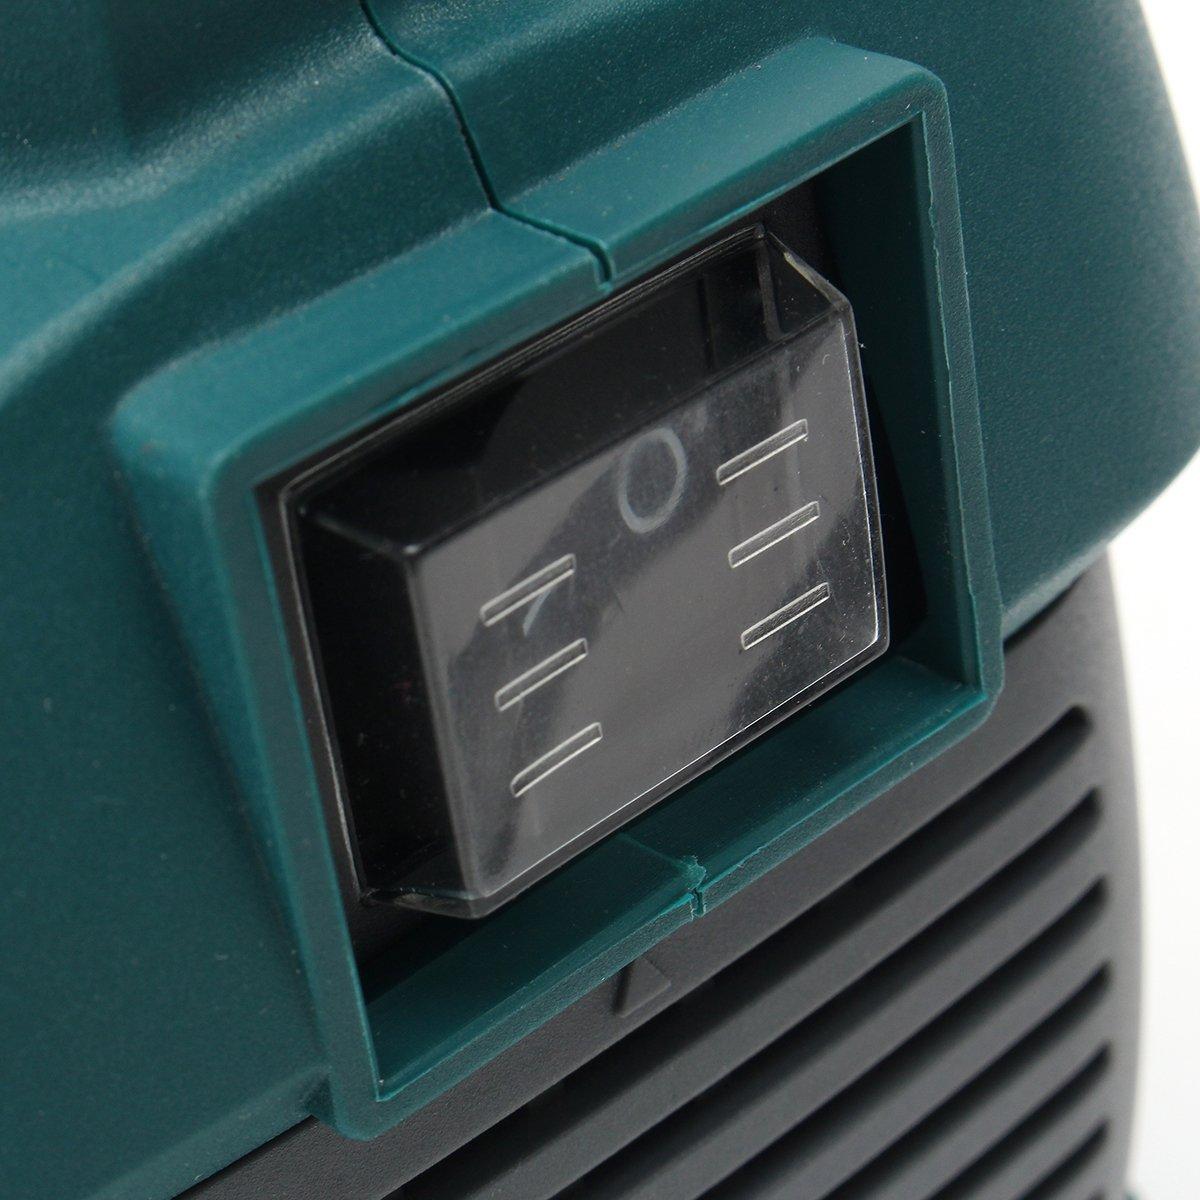 800W 900ML Electric Painter Gun Spray Latex Paint Sprayer House Painting Machine by Ologymart (Image #4)